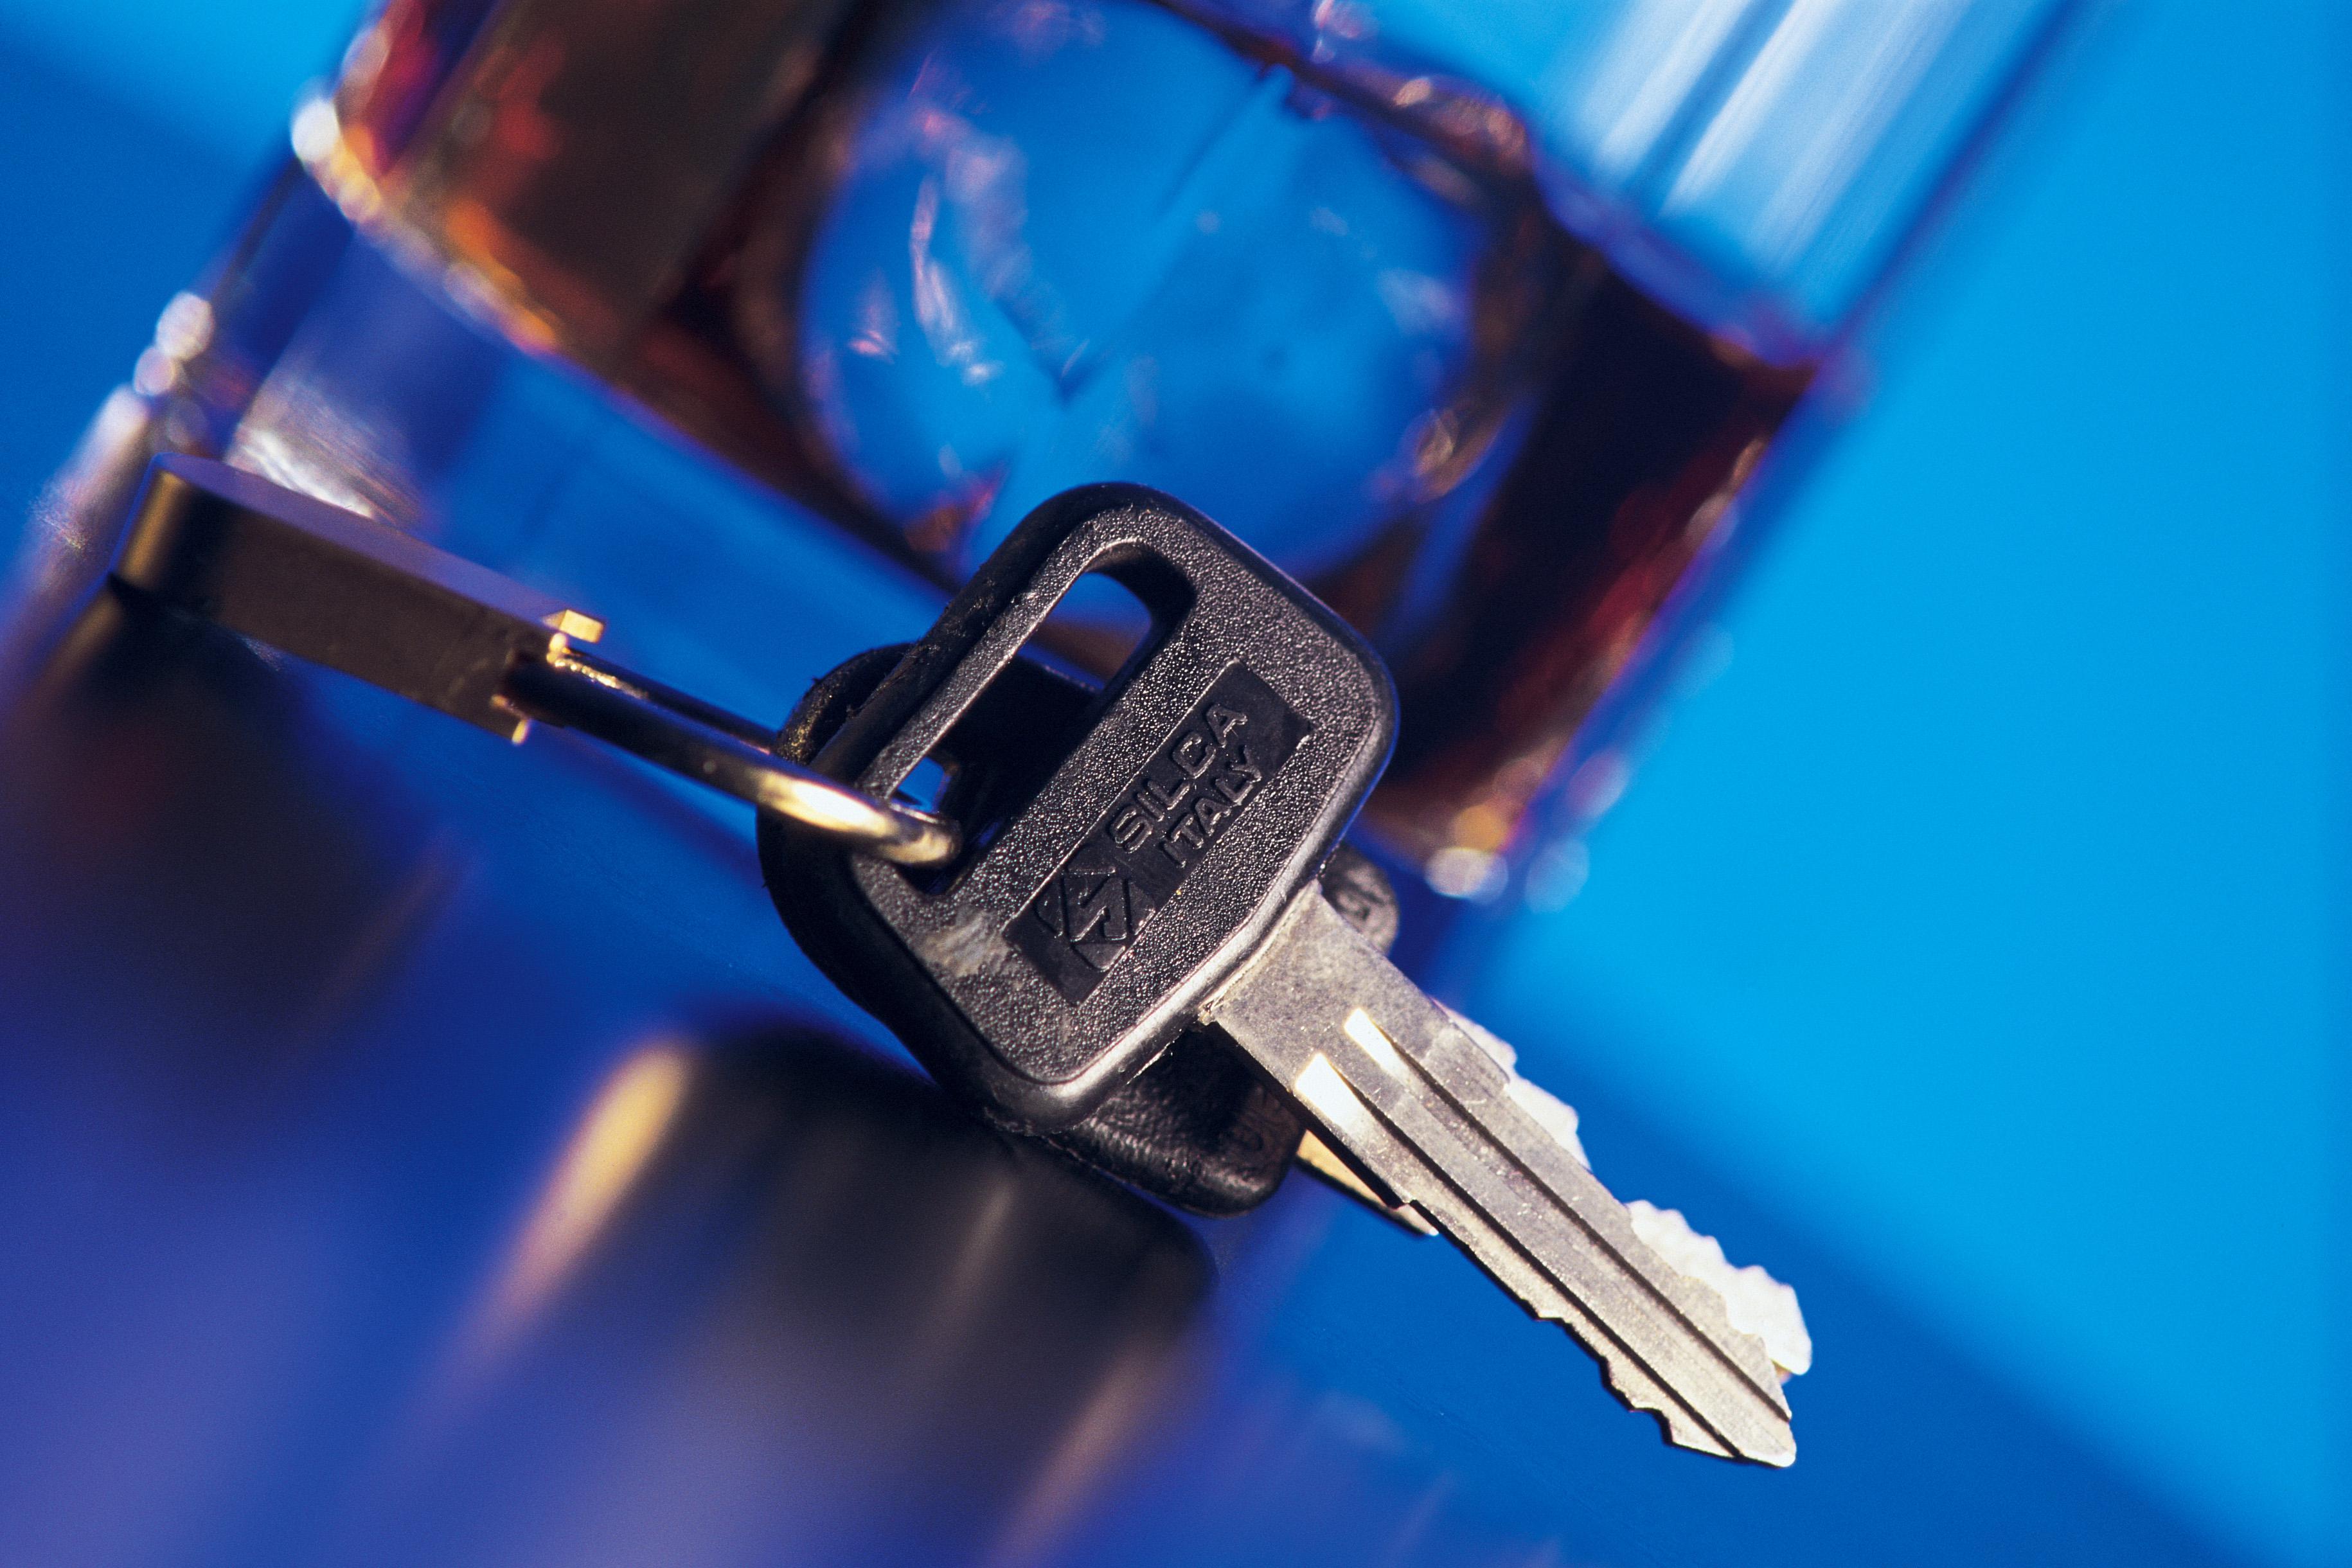 Car keys next to alcoholic beverage